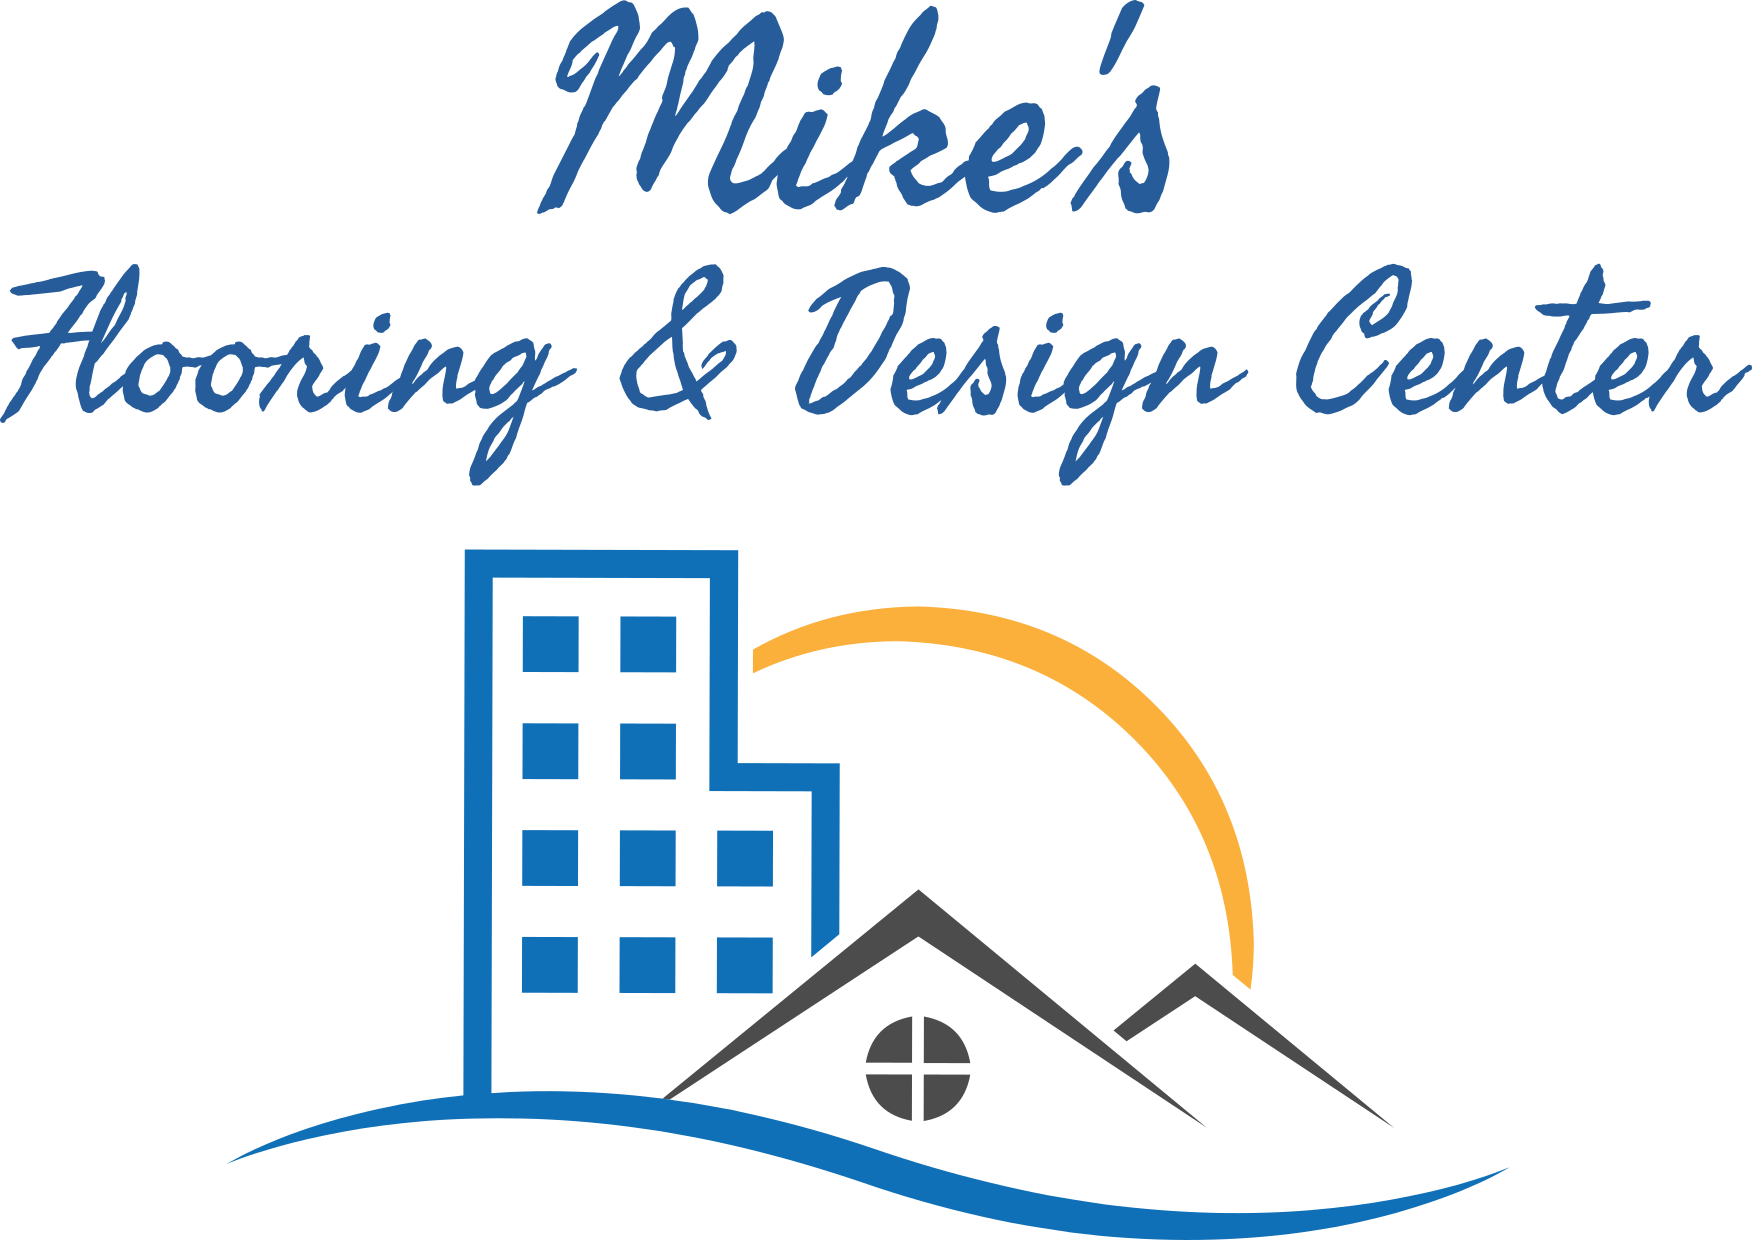 Mike's Flooring & Design Center